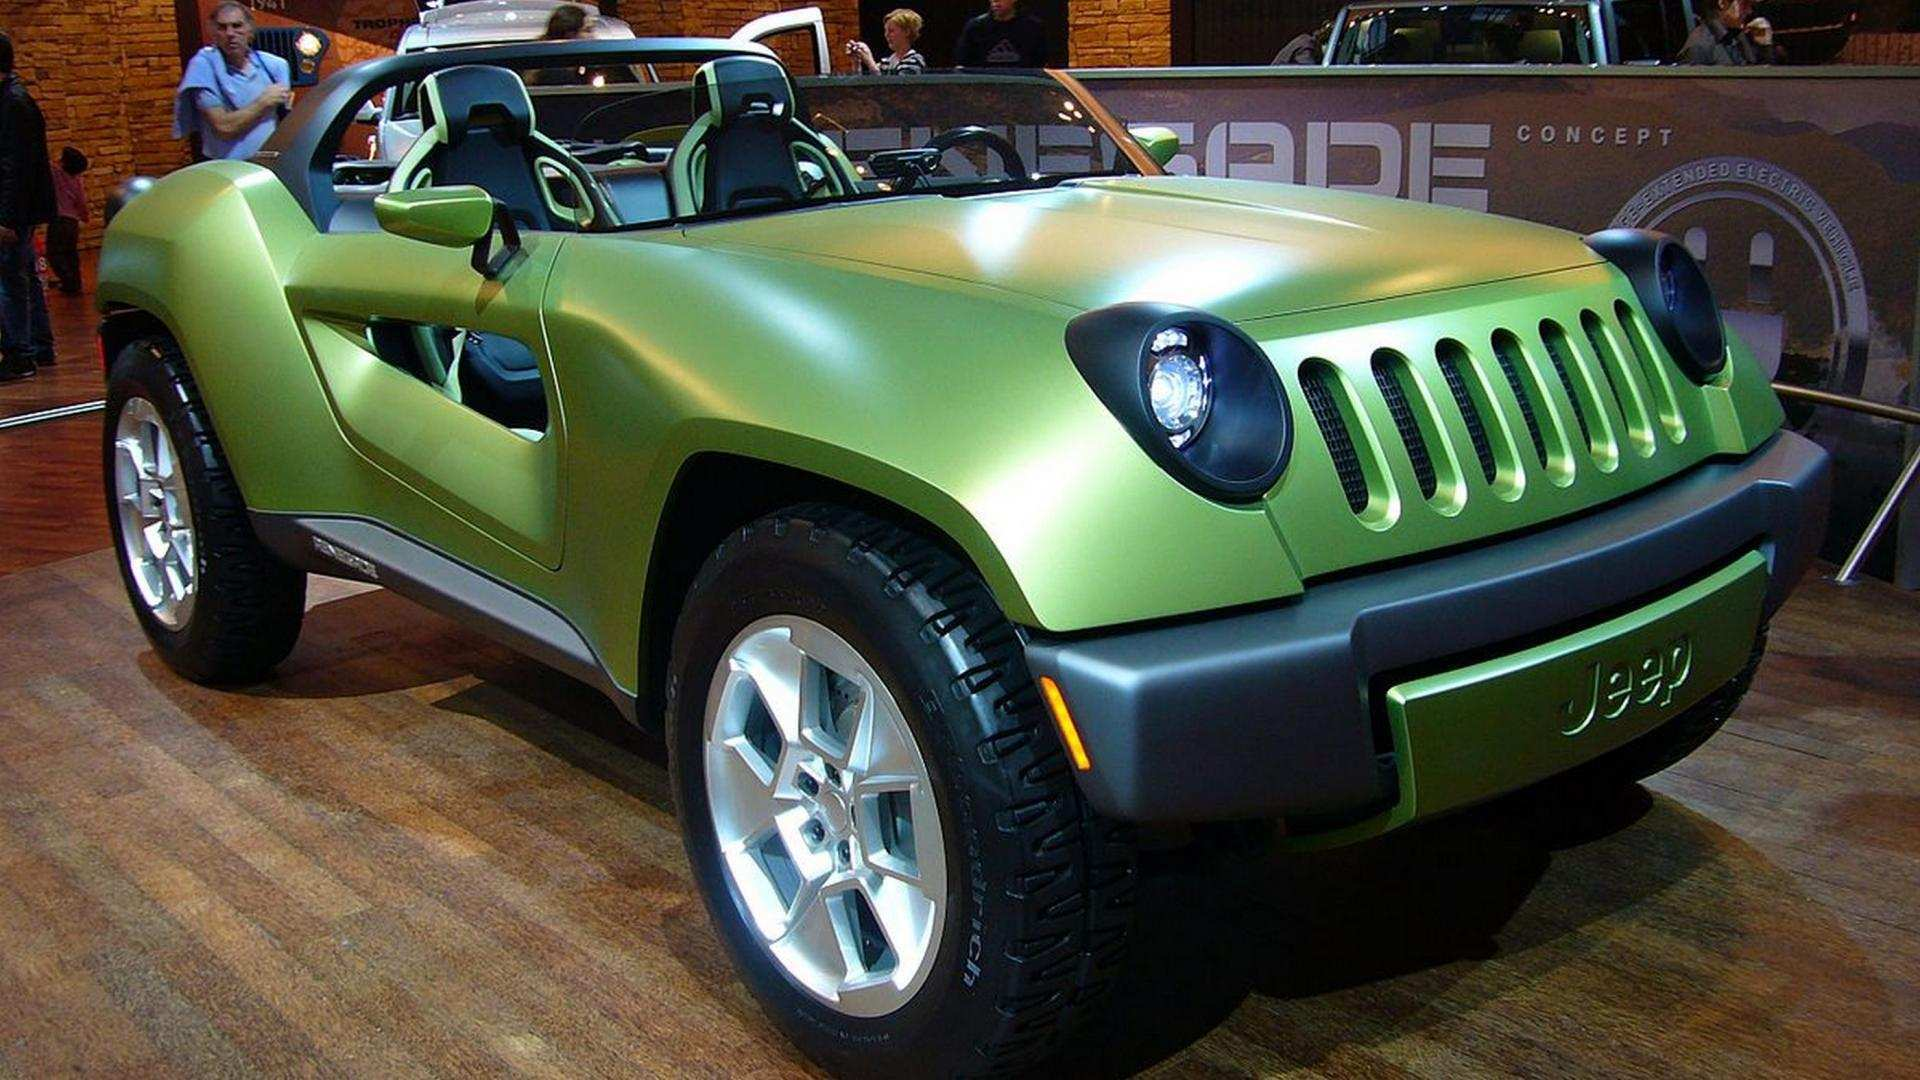 49 The Jeep Nuovi Modelli 2020 Performance and New Engine by Jeep Nuovi Modelli 2020